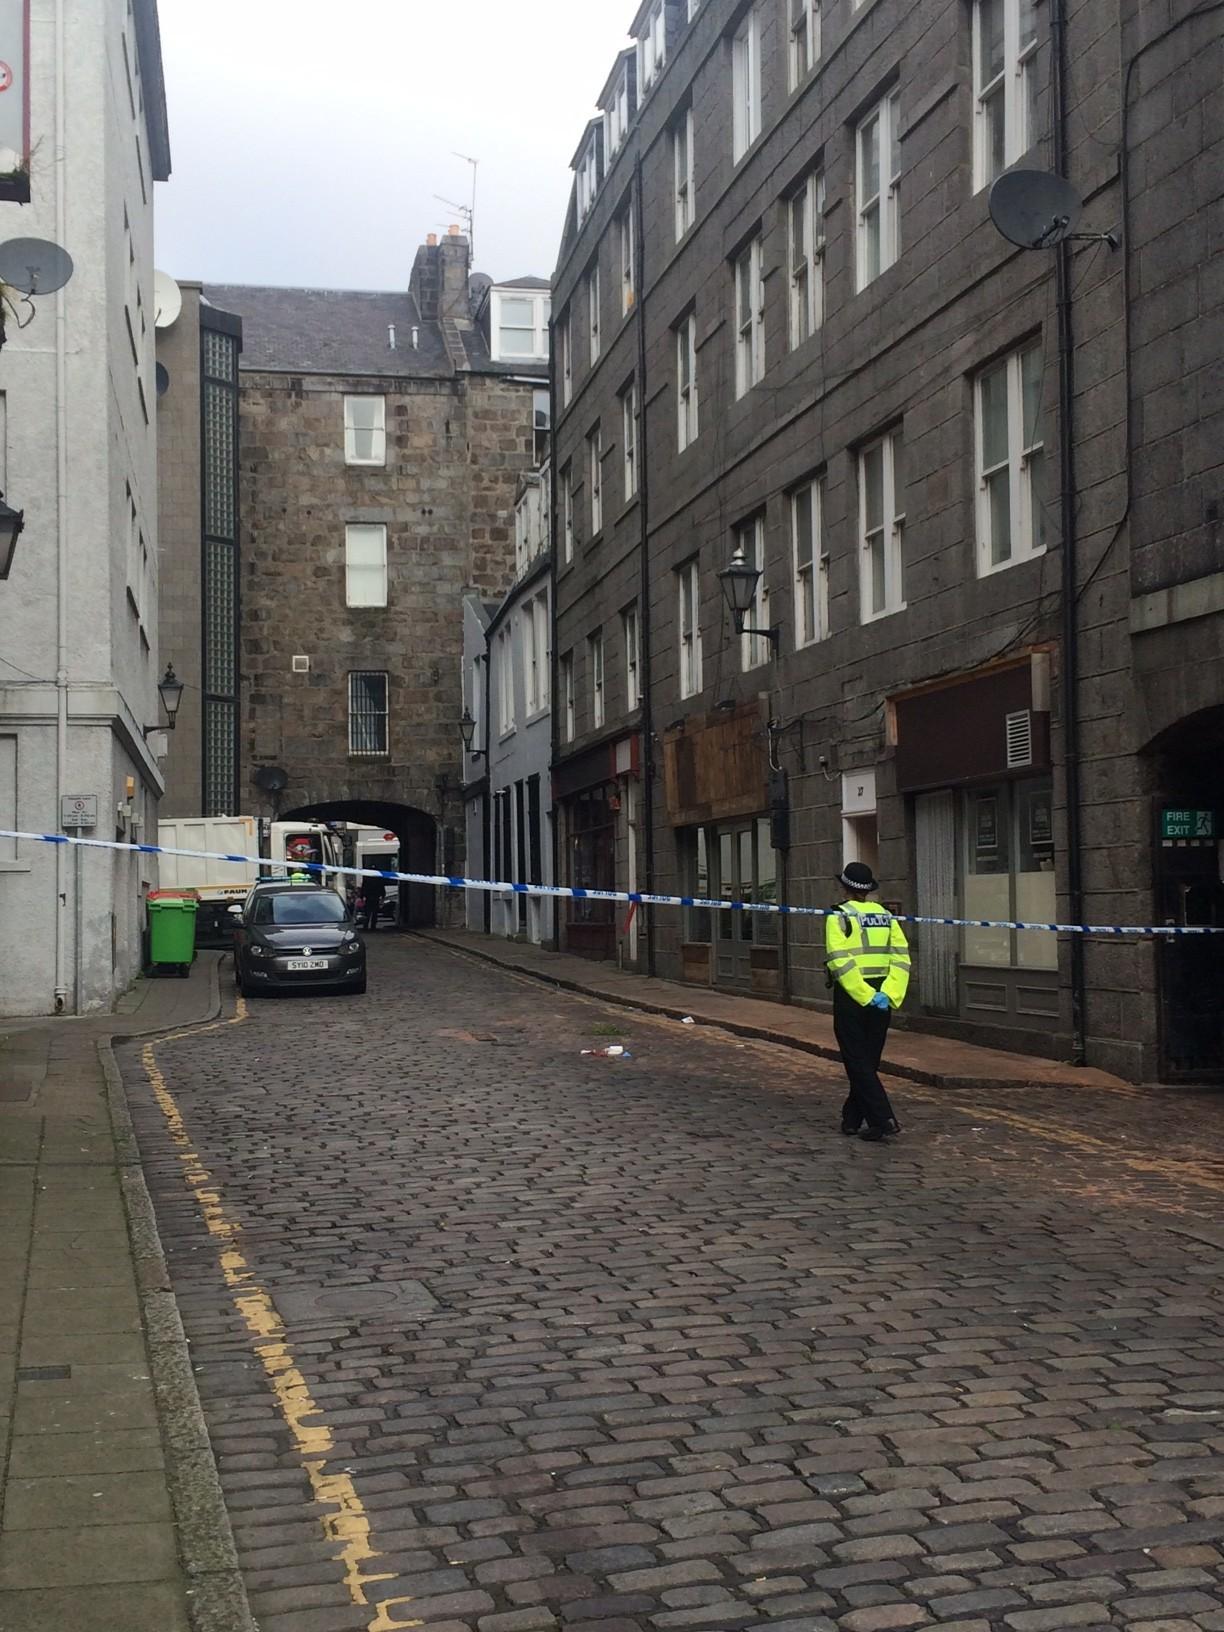 Scene of the incident on Adelphi Lane in Aberdeen